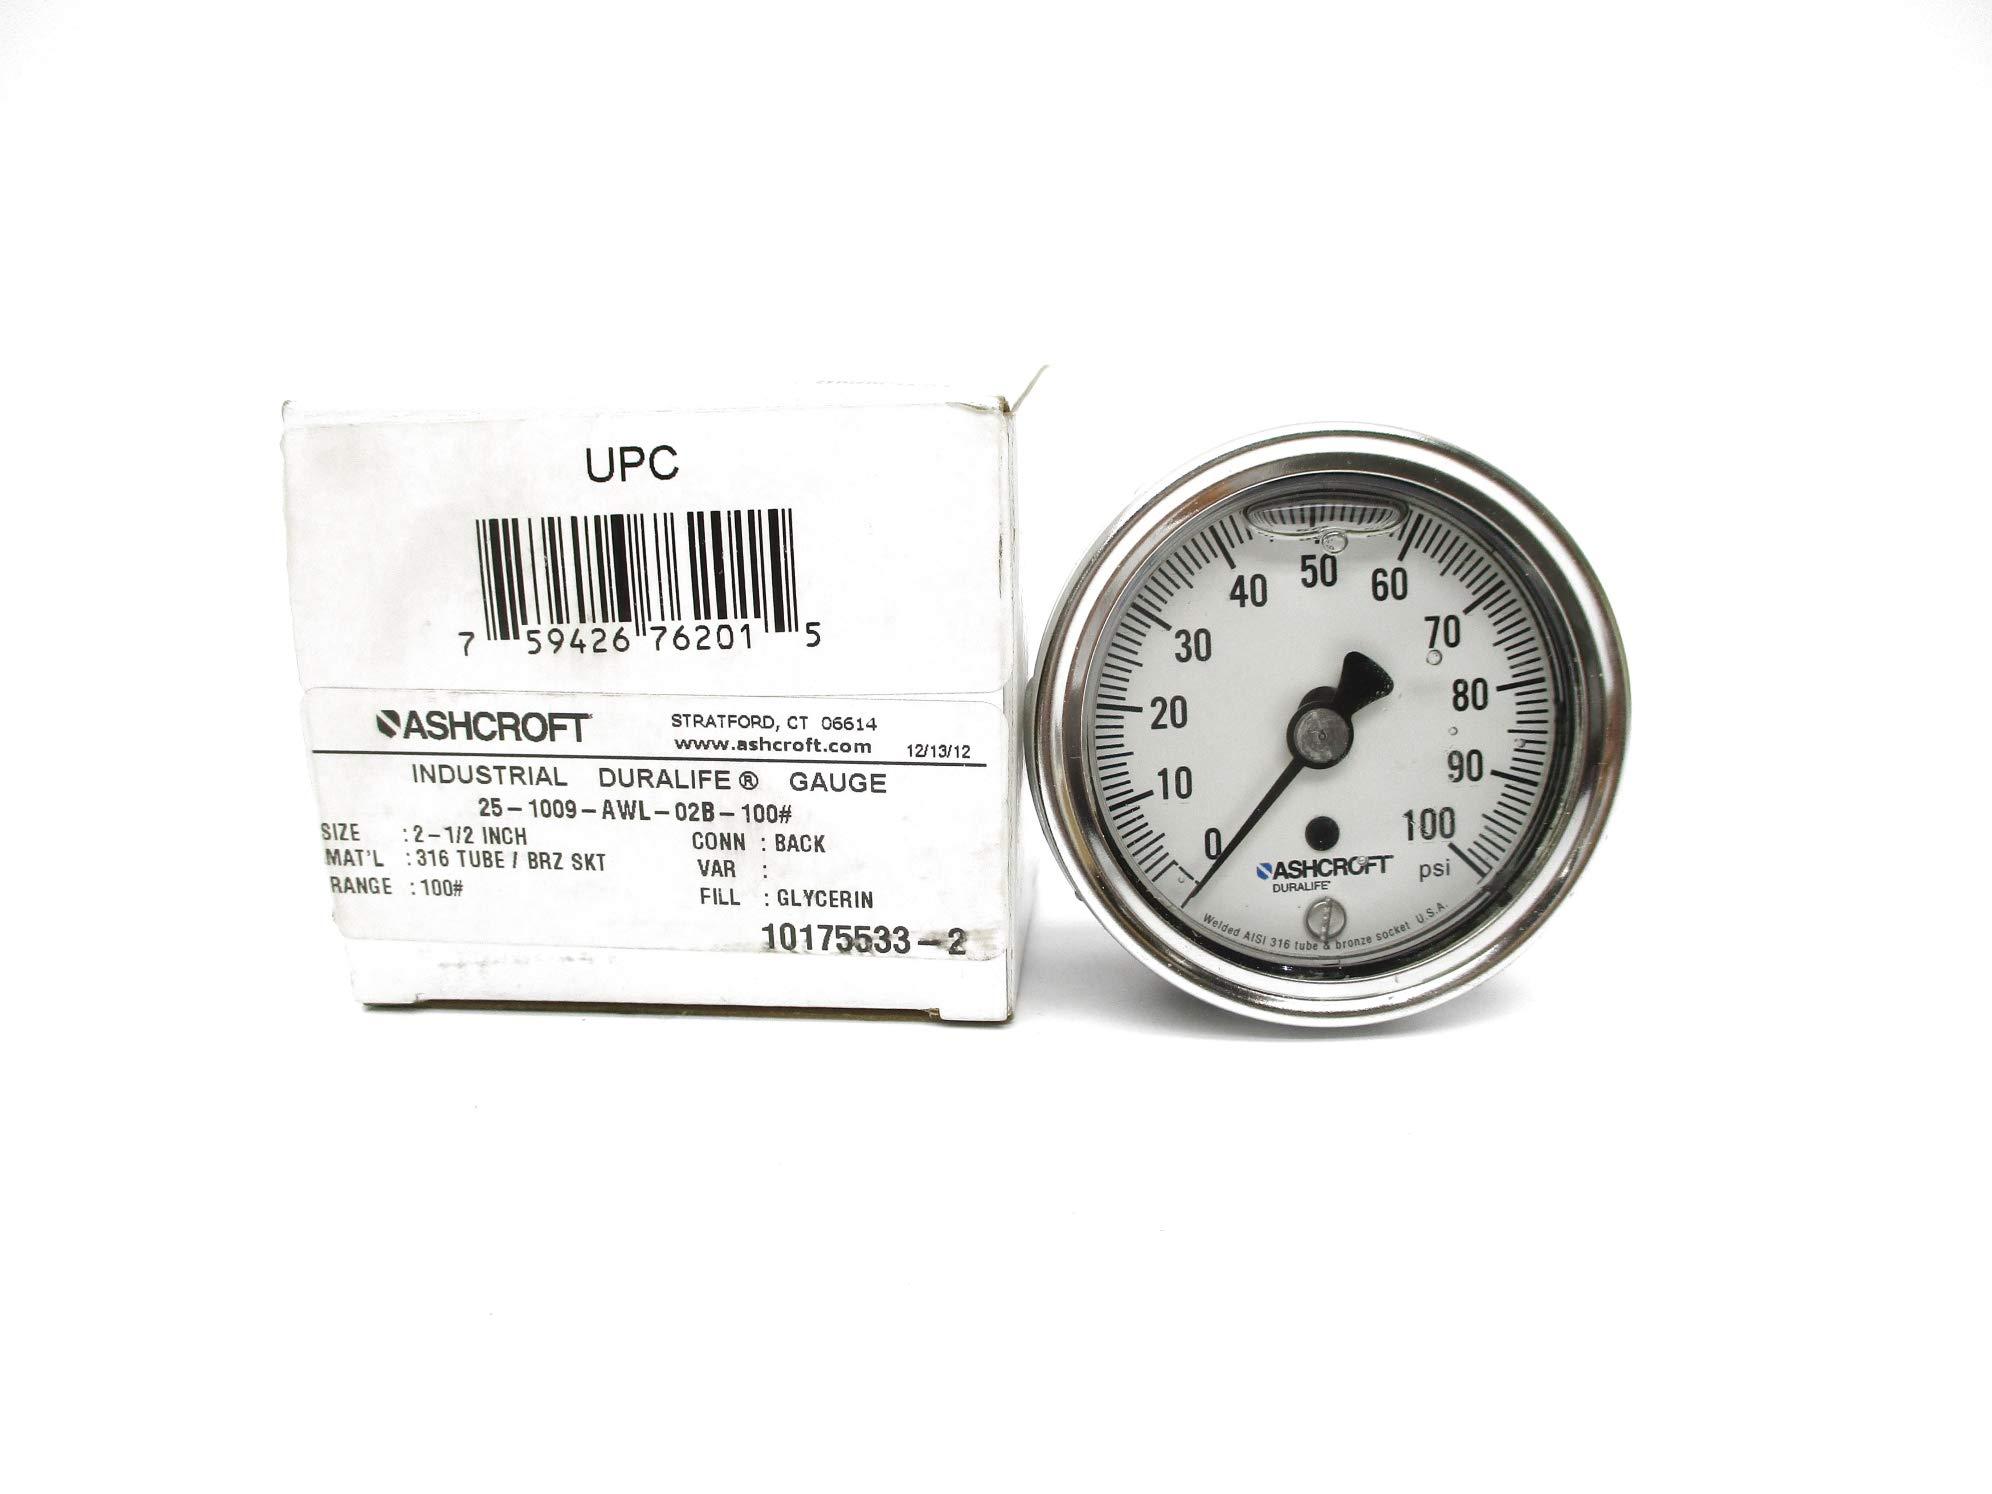 Ashcroft 25-1009-AWL-02B-100# 0-100PSI NSMP by INDUSTRIAL MRO